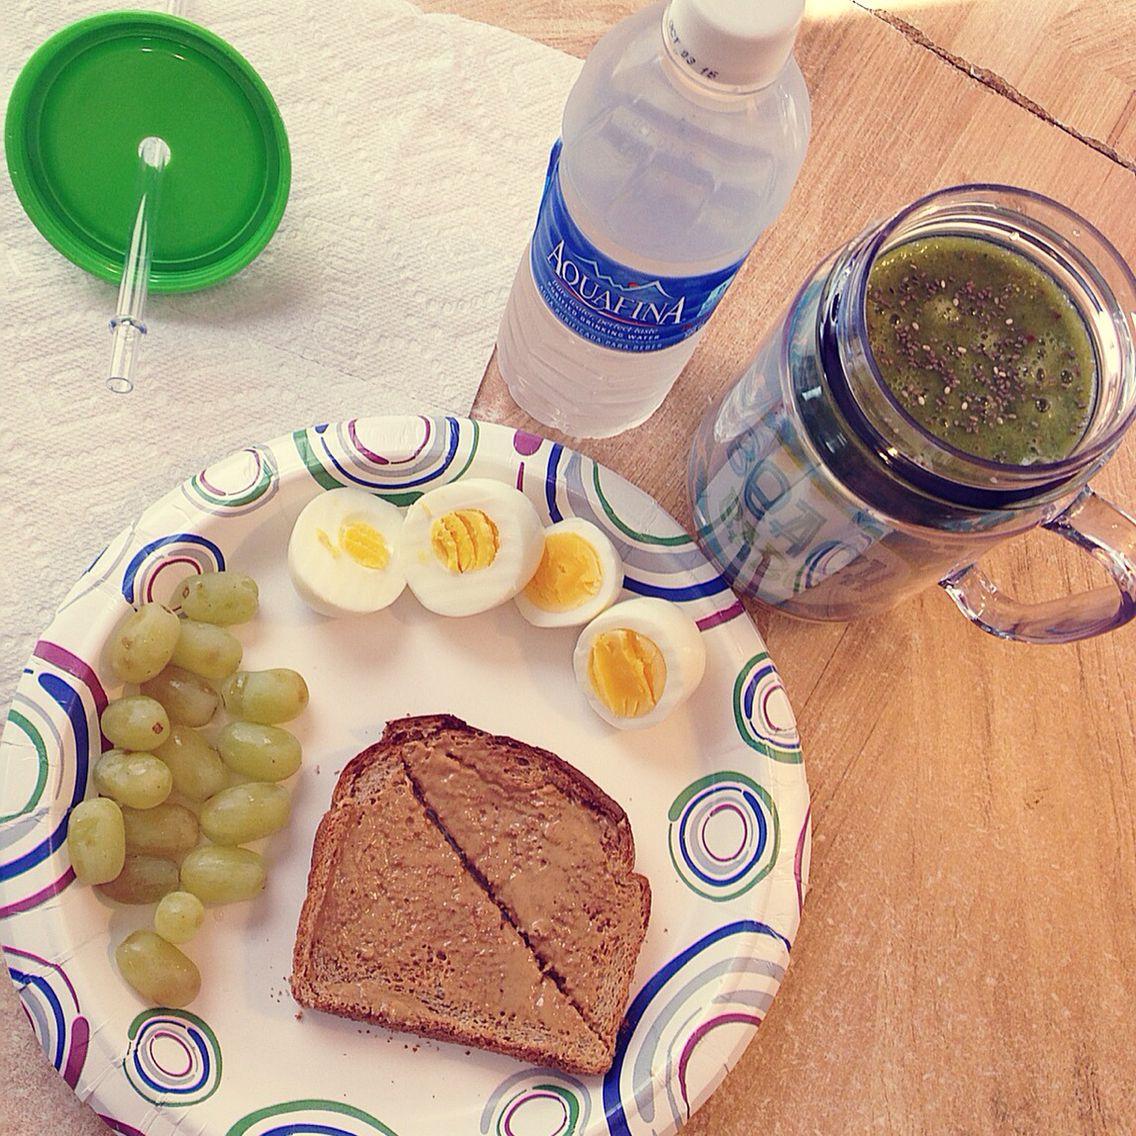 My breakfast I had today! #HealthyEating #Healthy #GreenSmoothie #Yummy